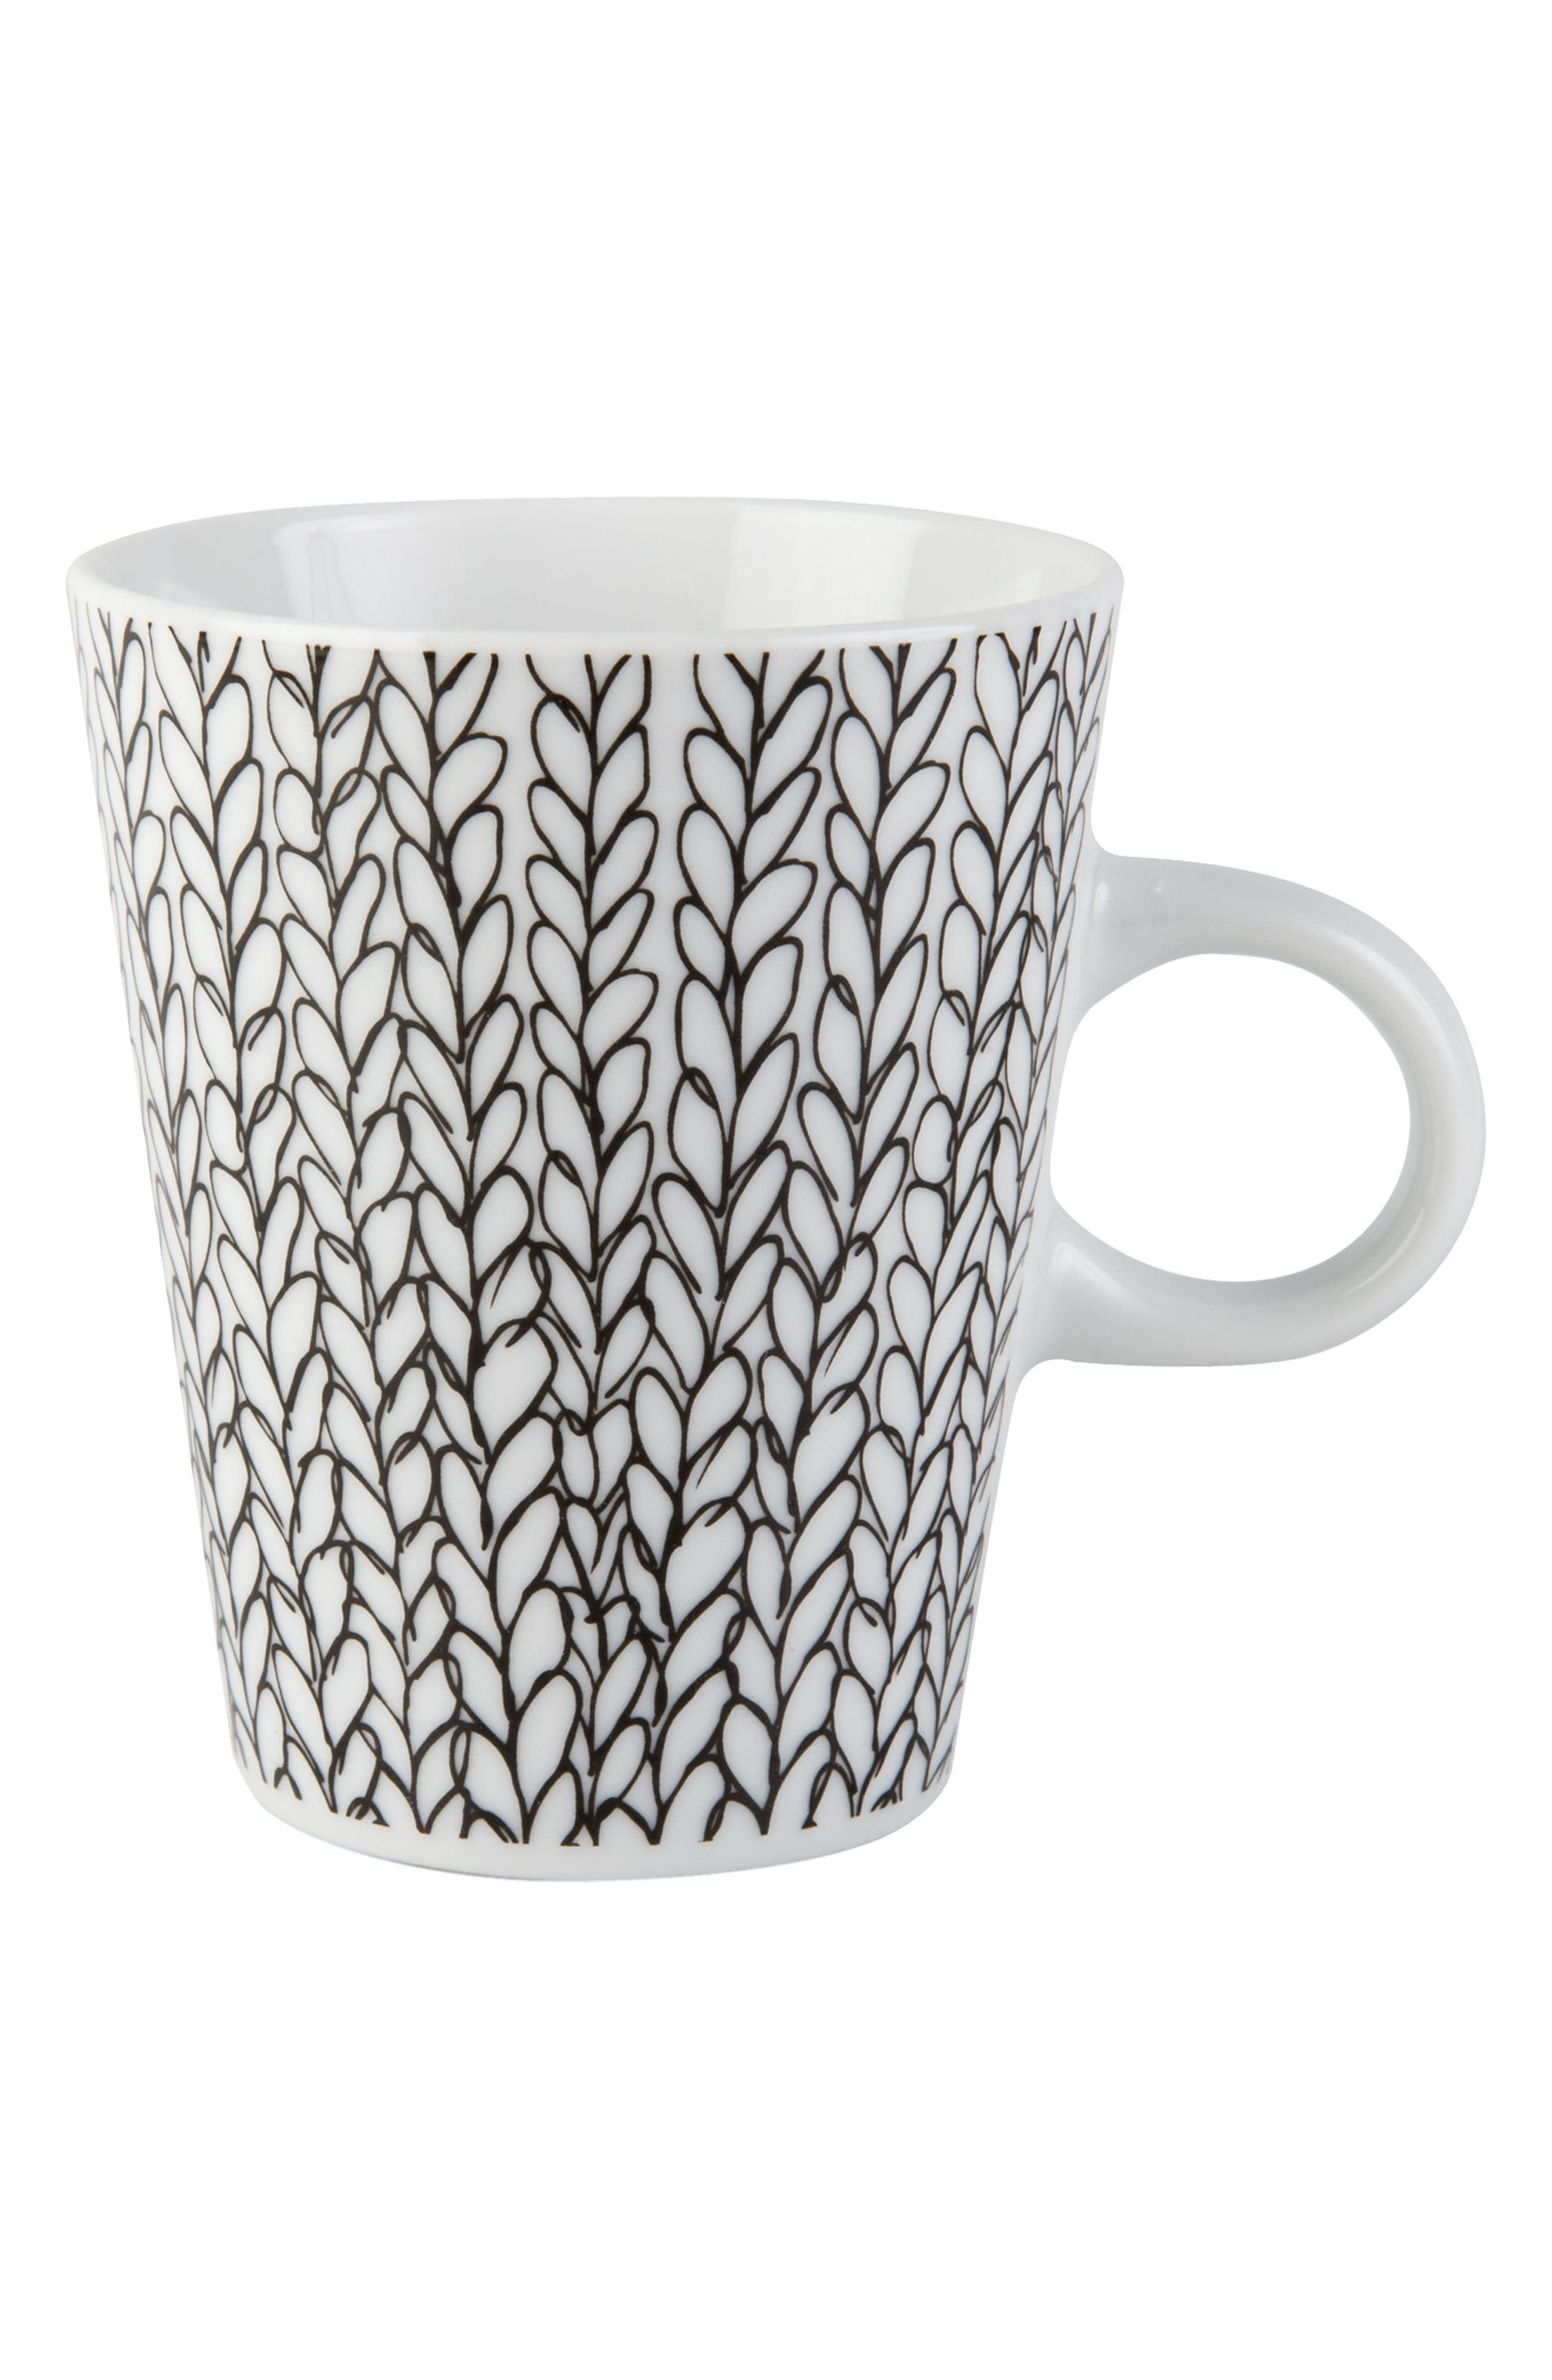 Patterned Porcelain Mug,                             Main thumbnail 1, color,                             100